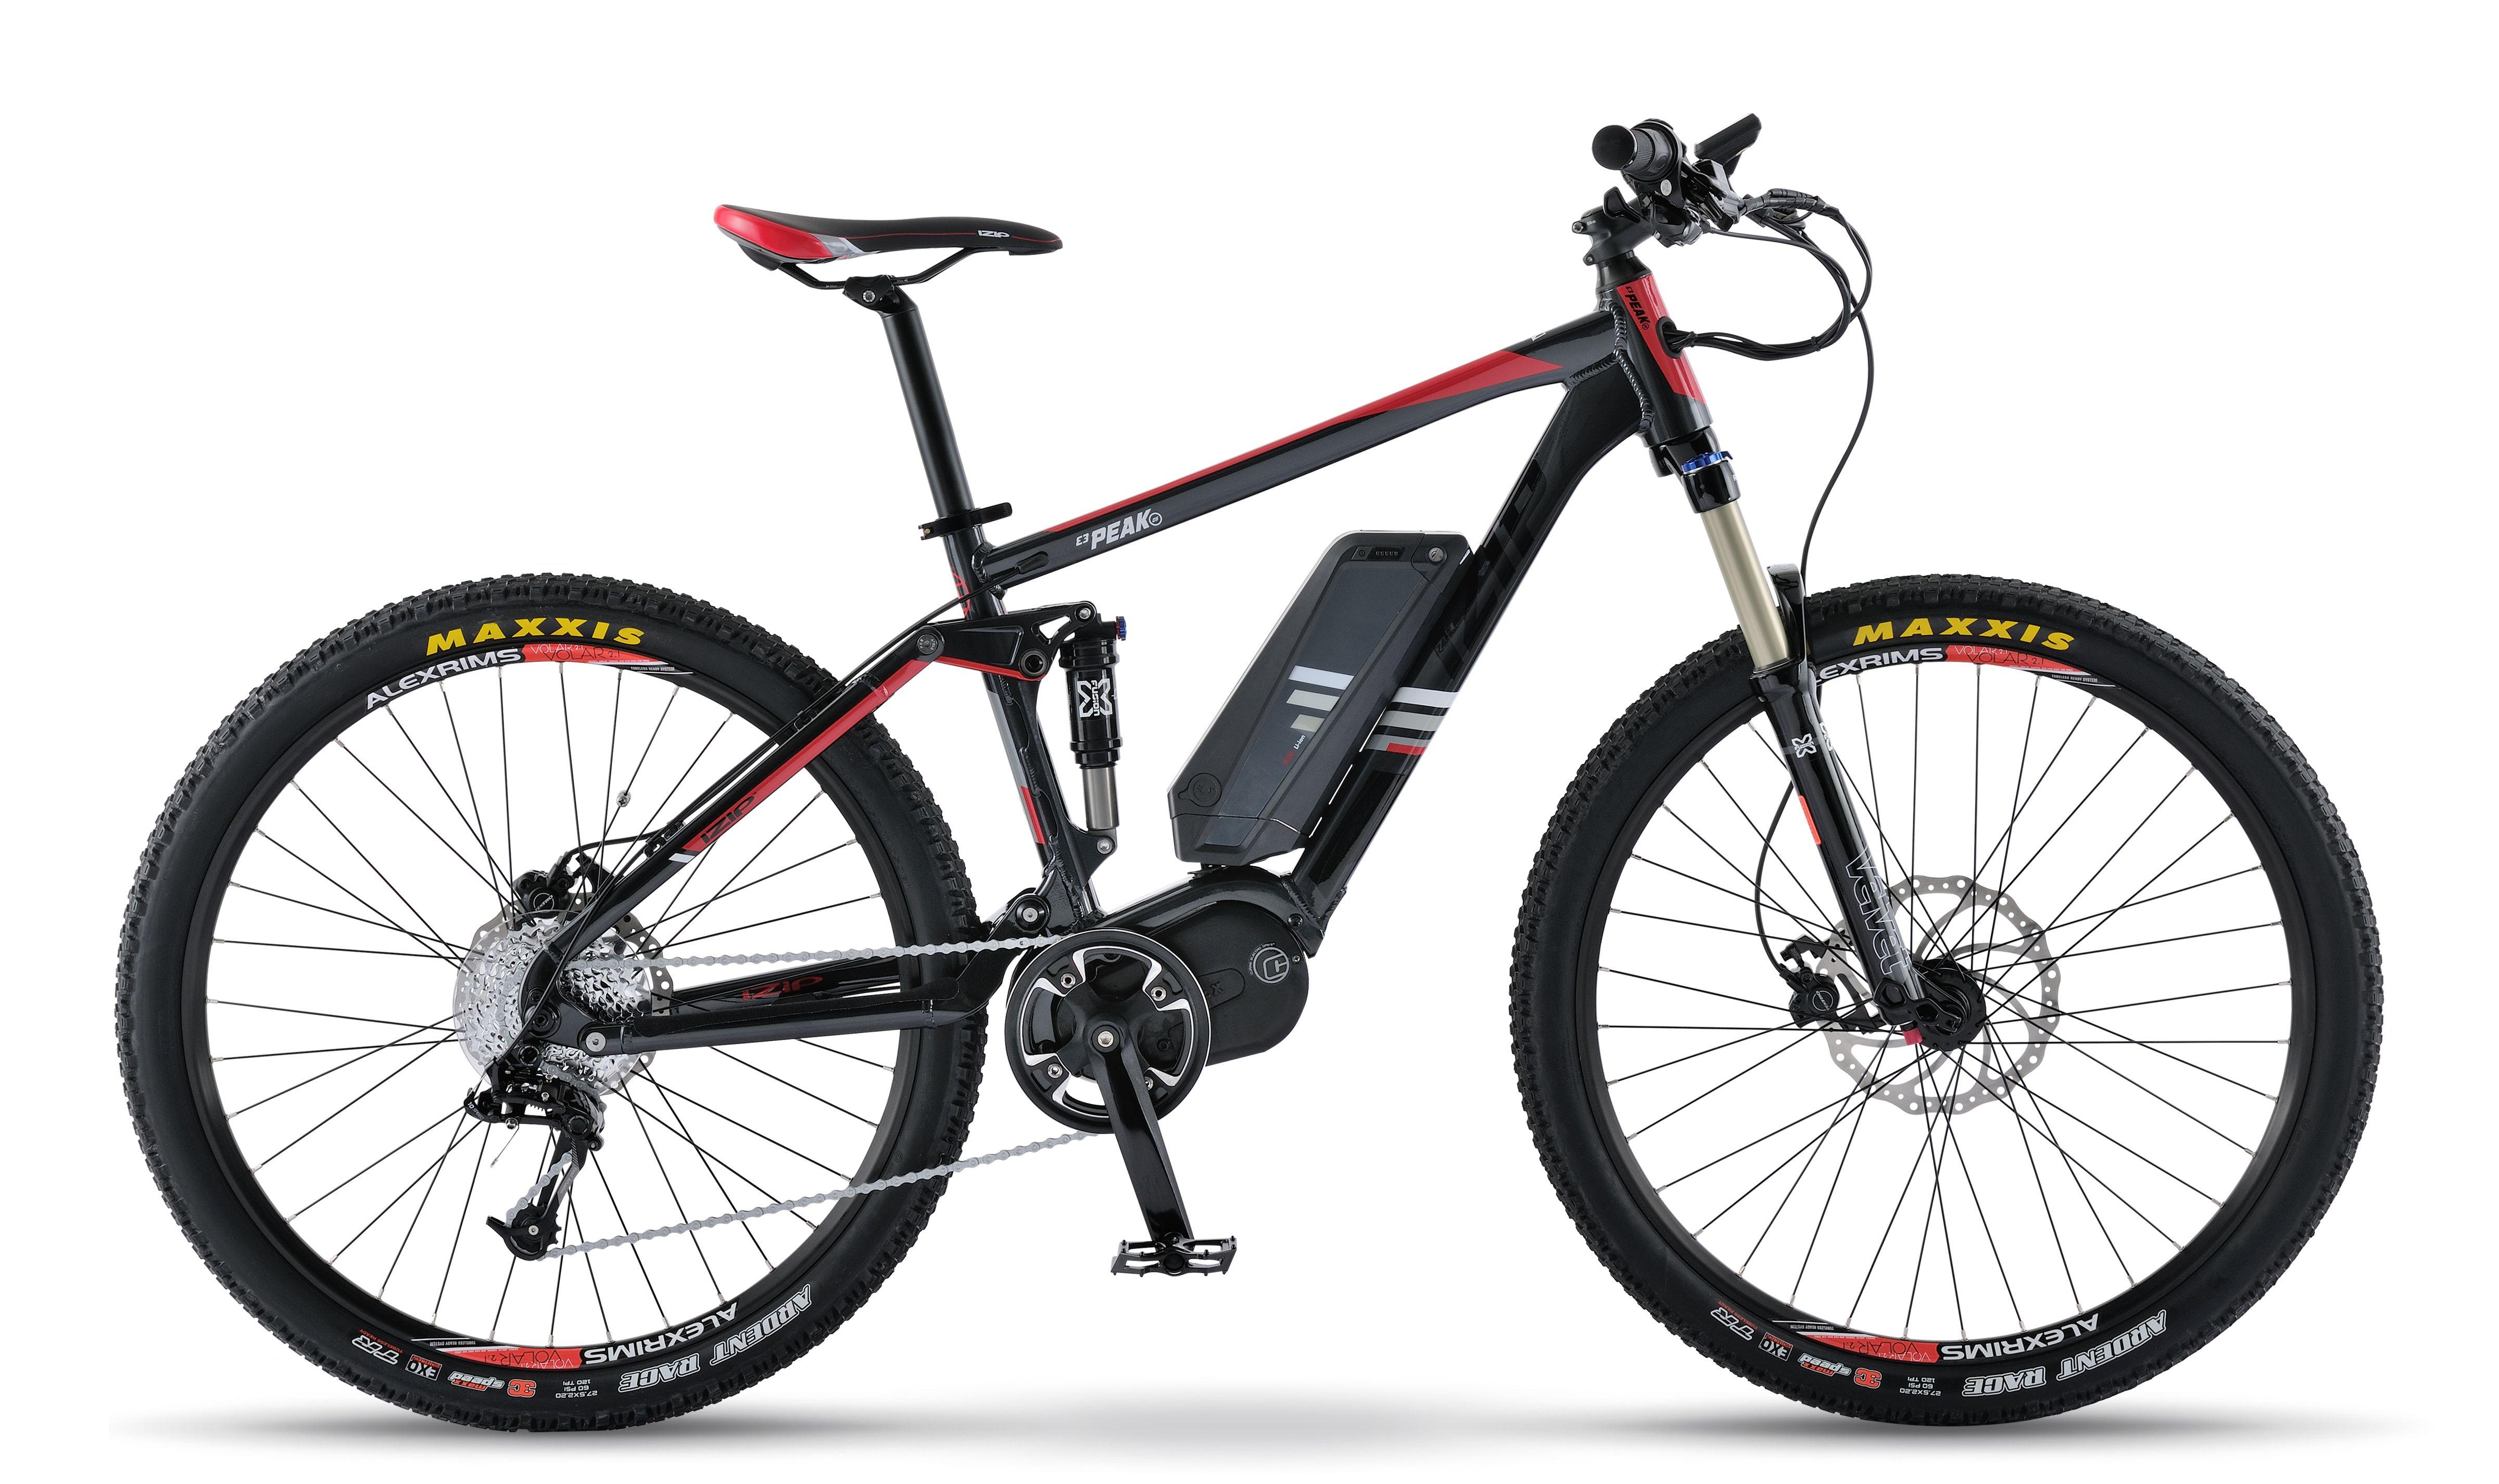 Izip E3 Peak Ds Mtn Electric Bike Electric Bike Bike Technology Dual Suspension Mountain Bike